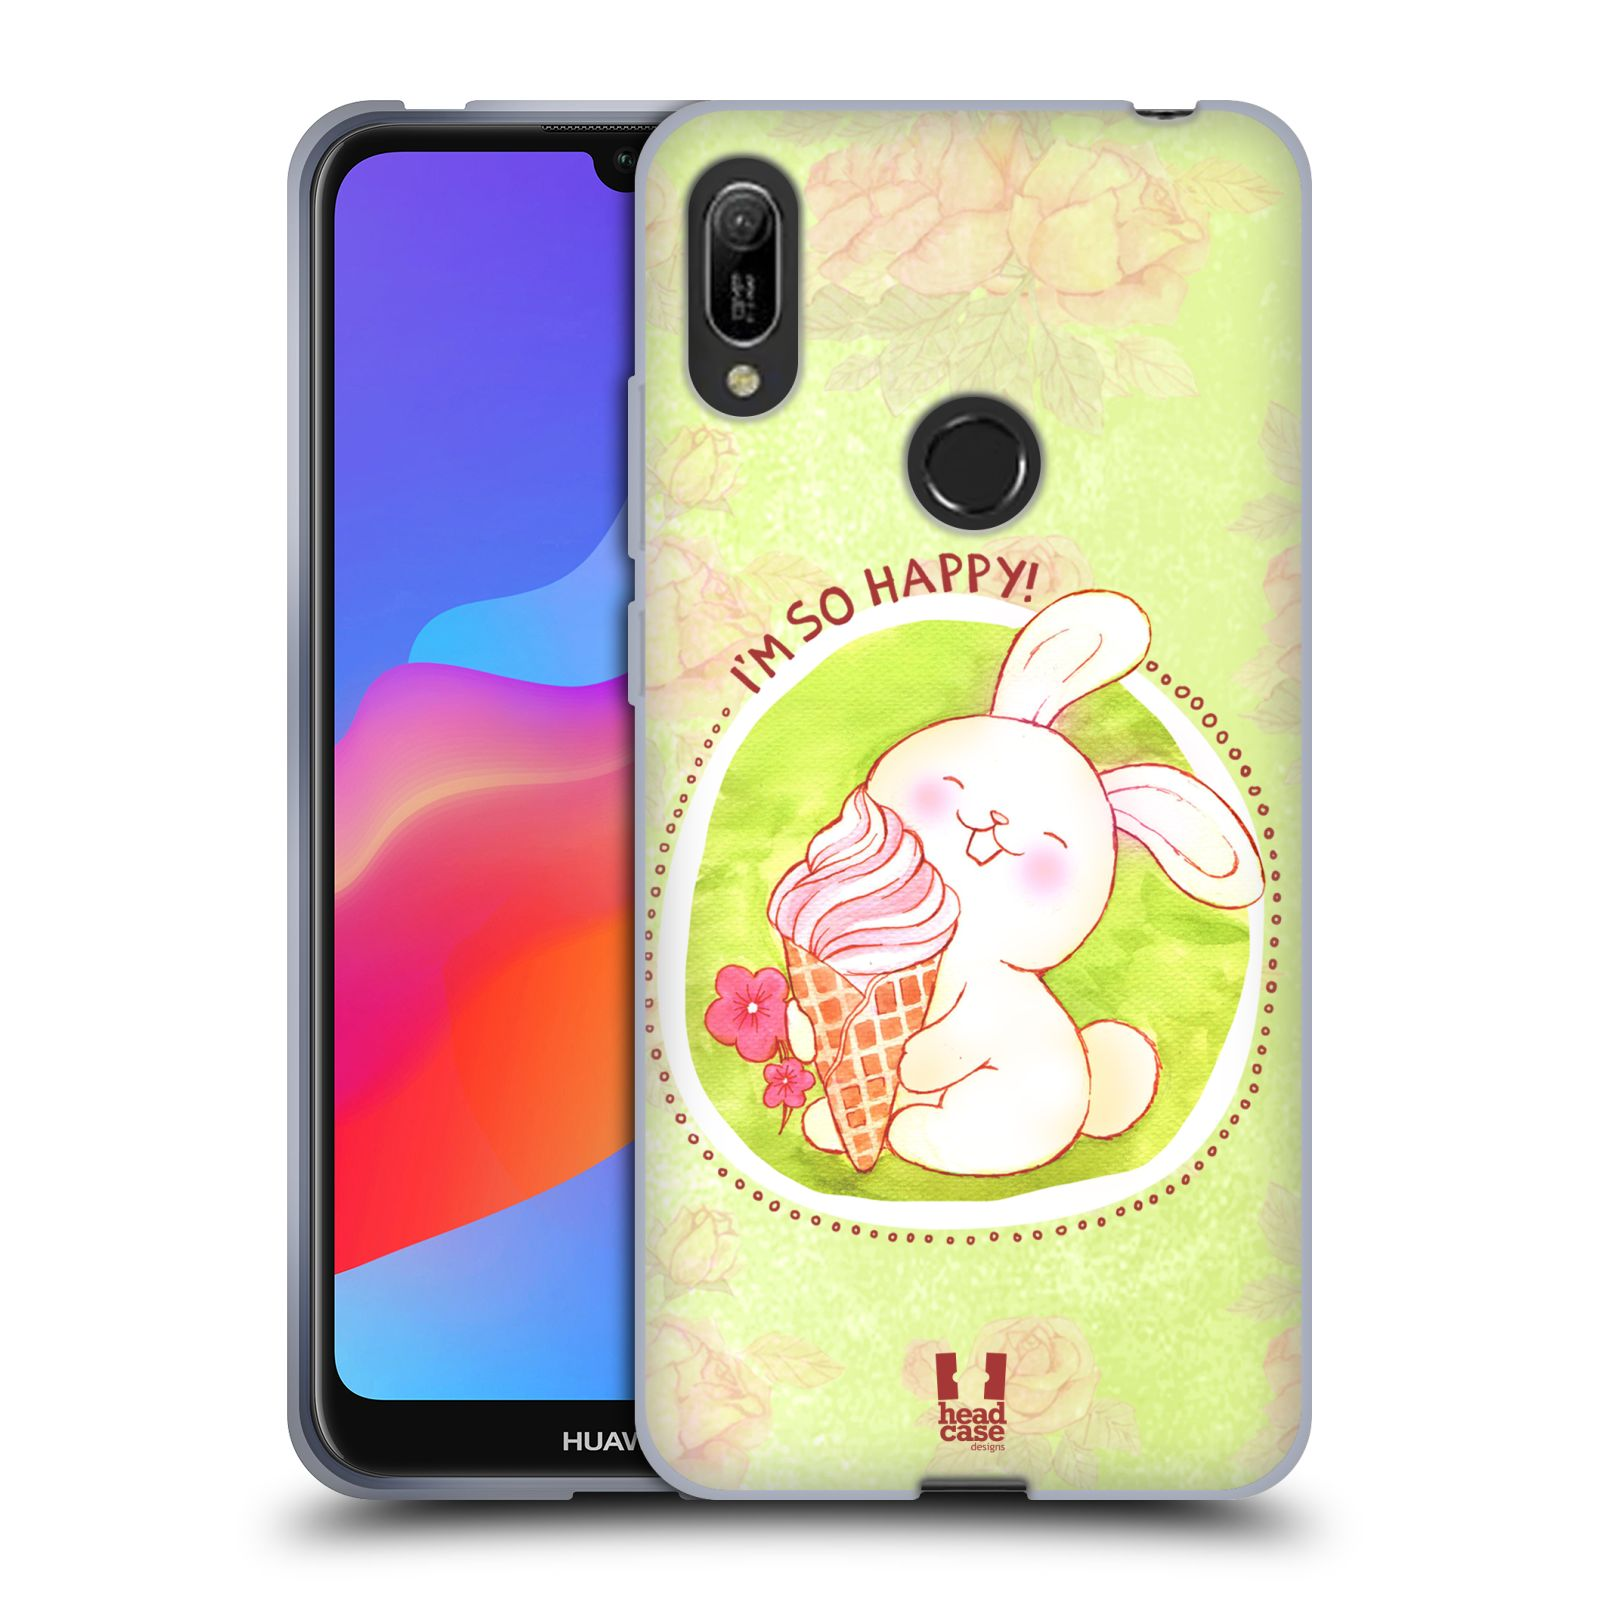 Silikonové pouzdro na mobil Huawei Y6 (2019) - Head Case - KRÁLÍČEK A ZMRZKA